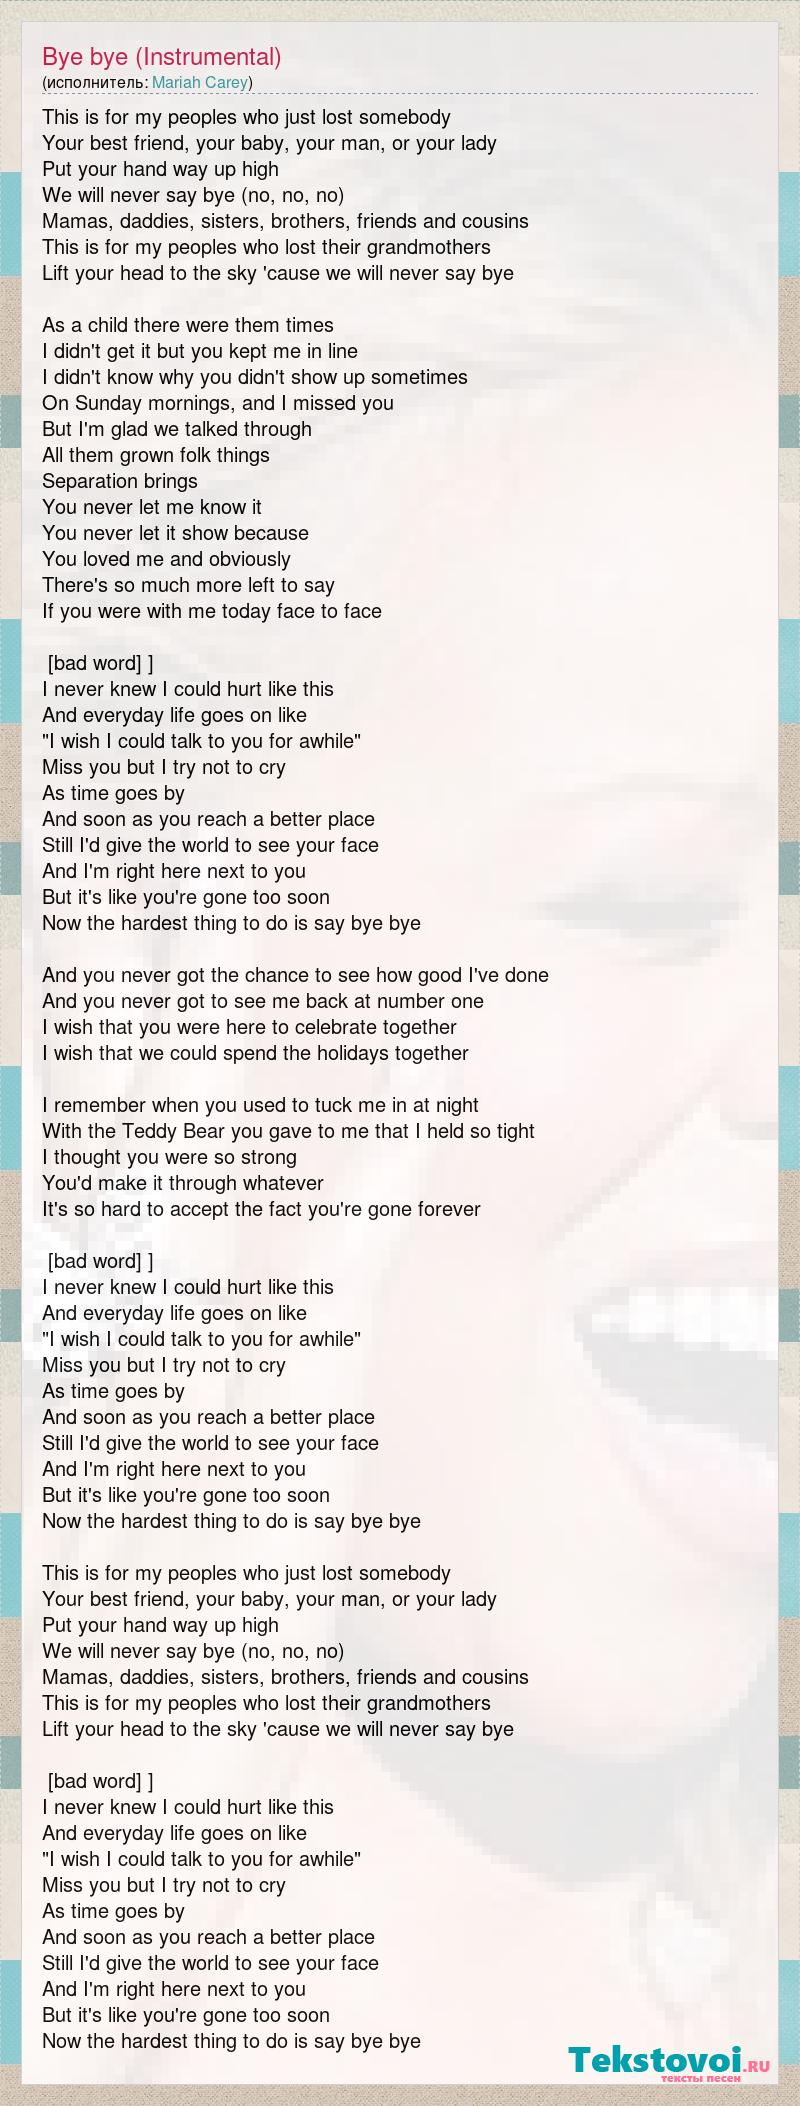 Mariah Carey: Bye bye (Instrumental) слова песни